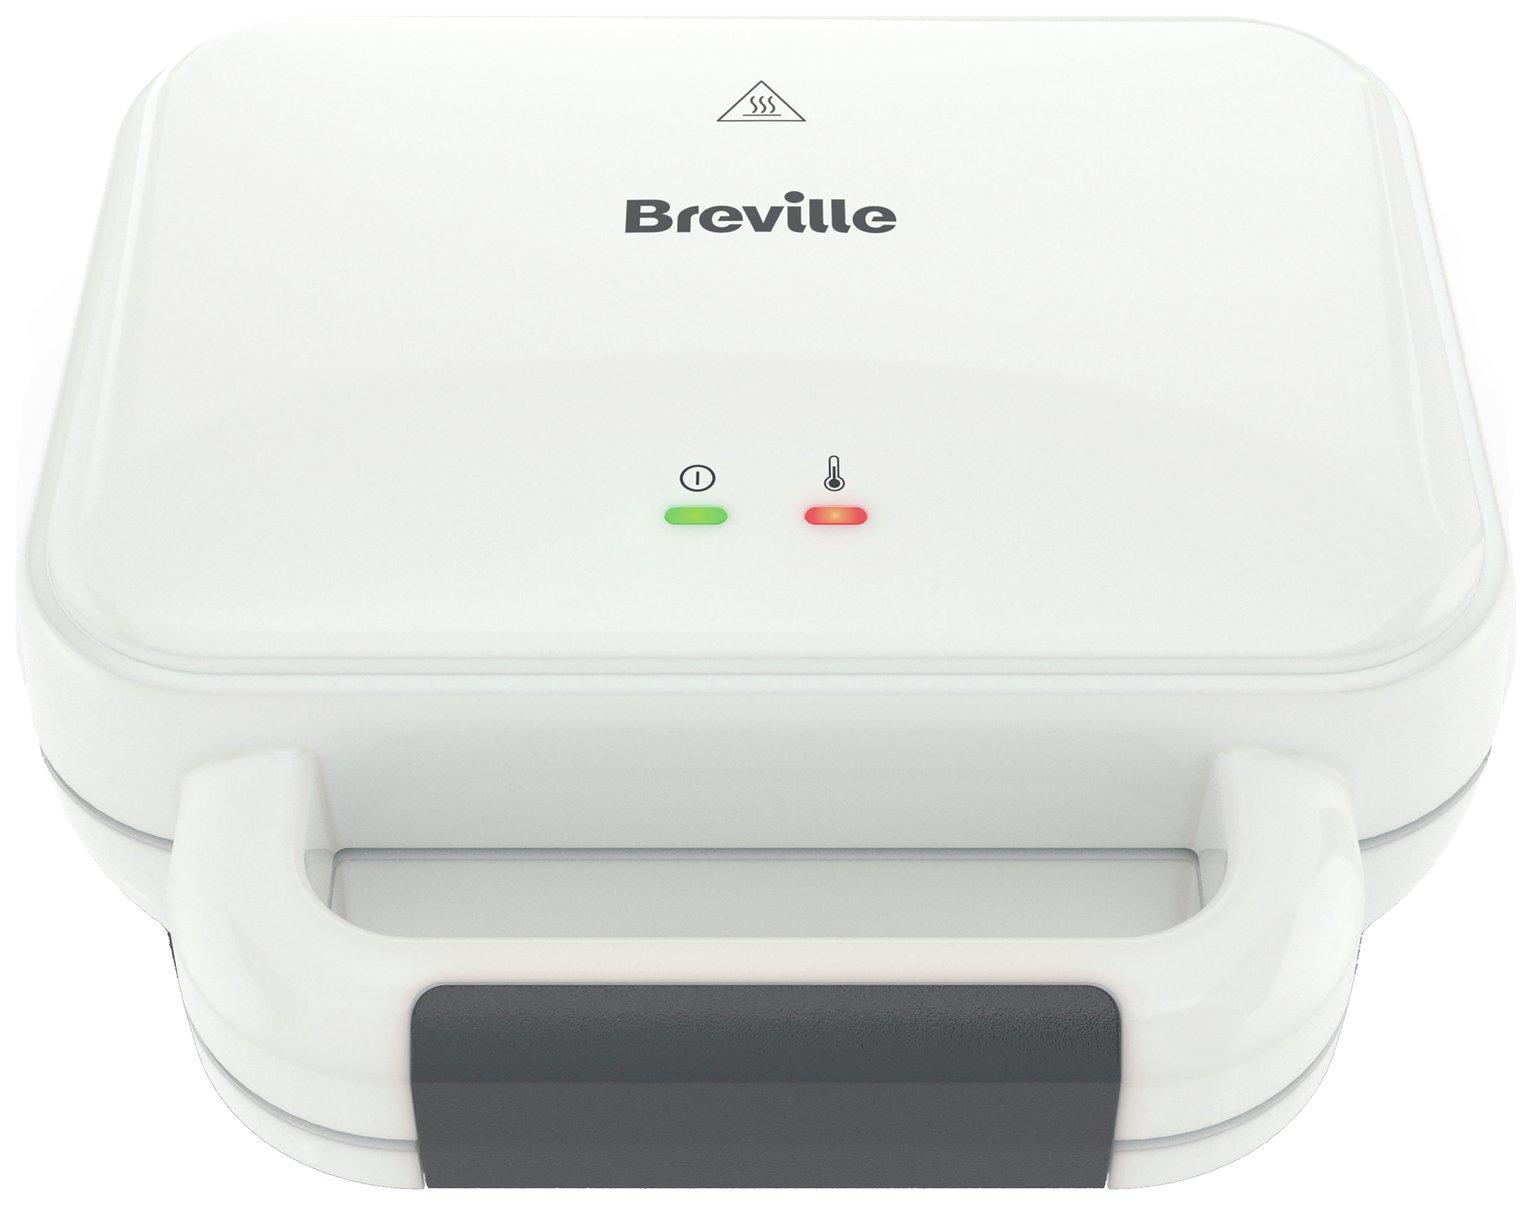 Breville VST091 Deep Fill 2 Portion Sandwich Toaster - White